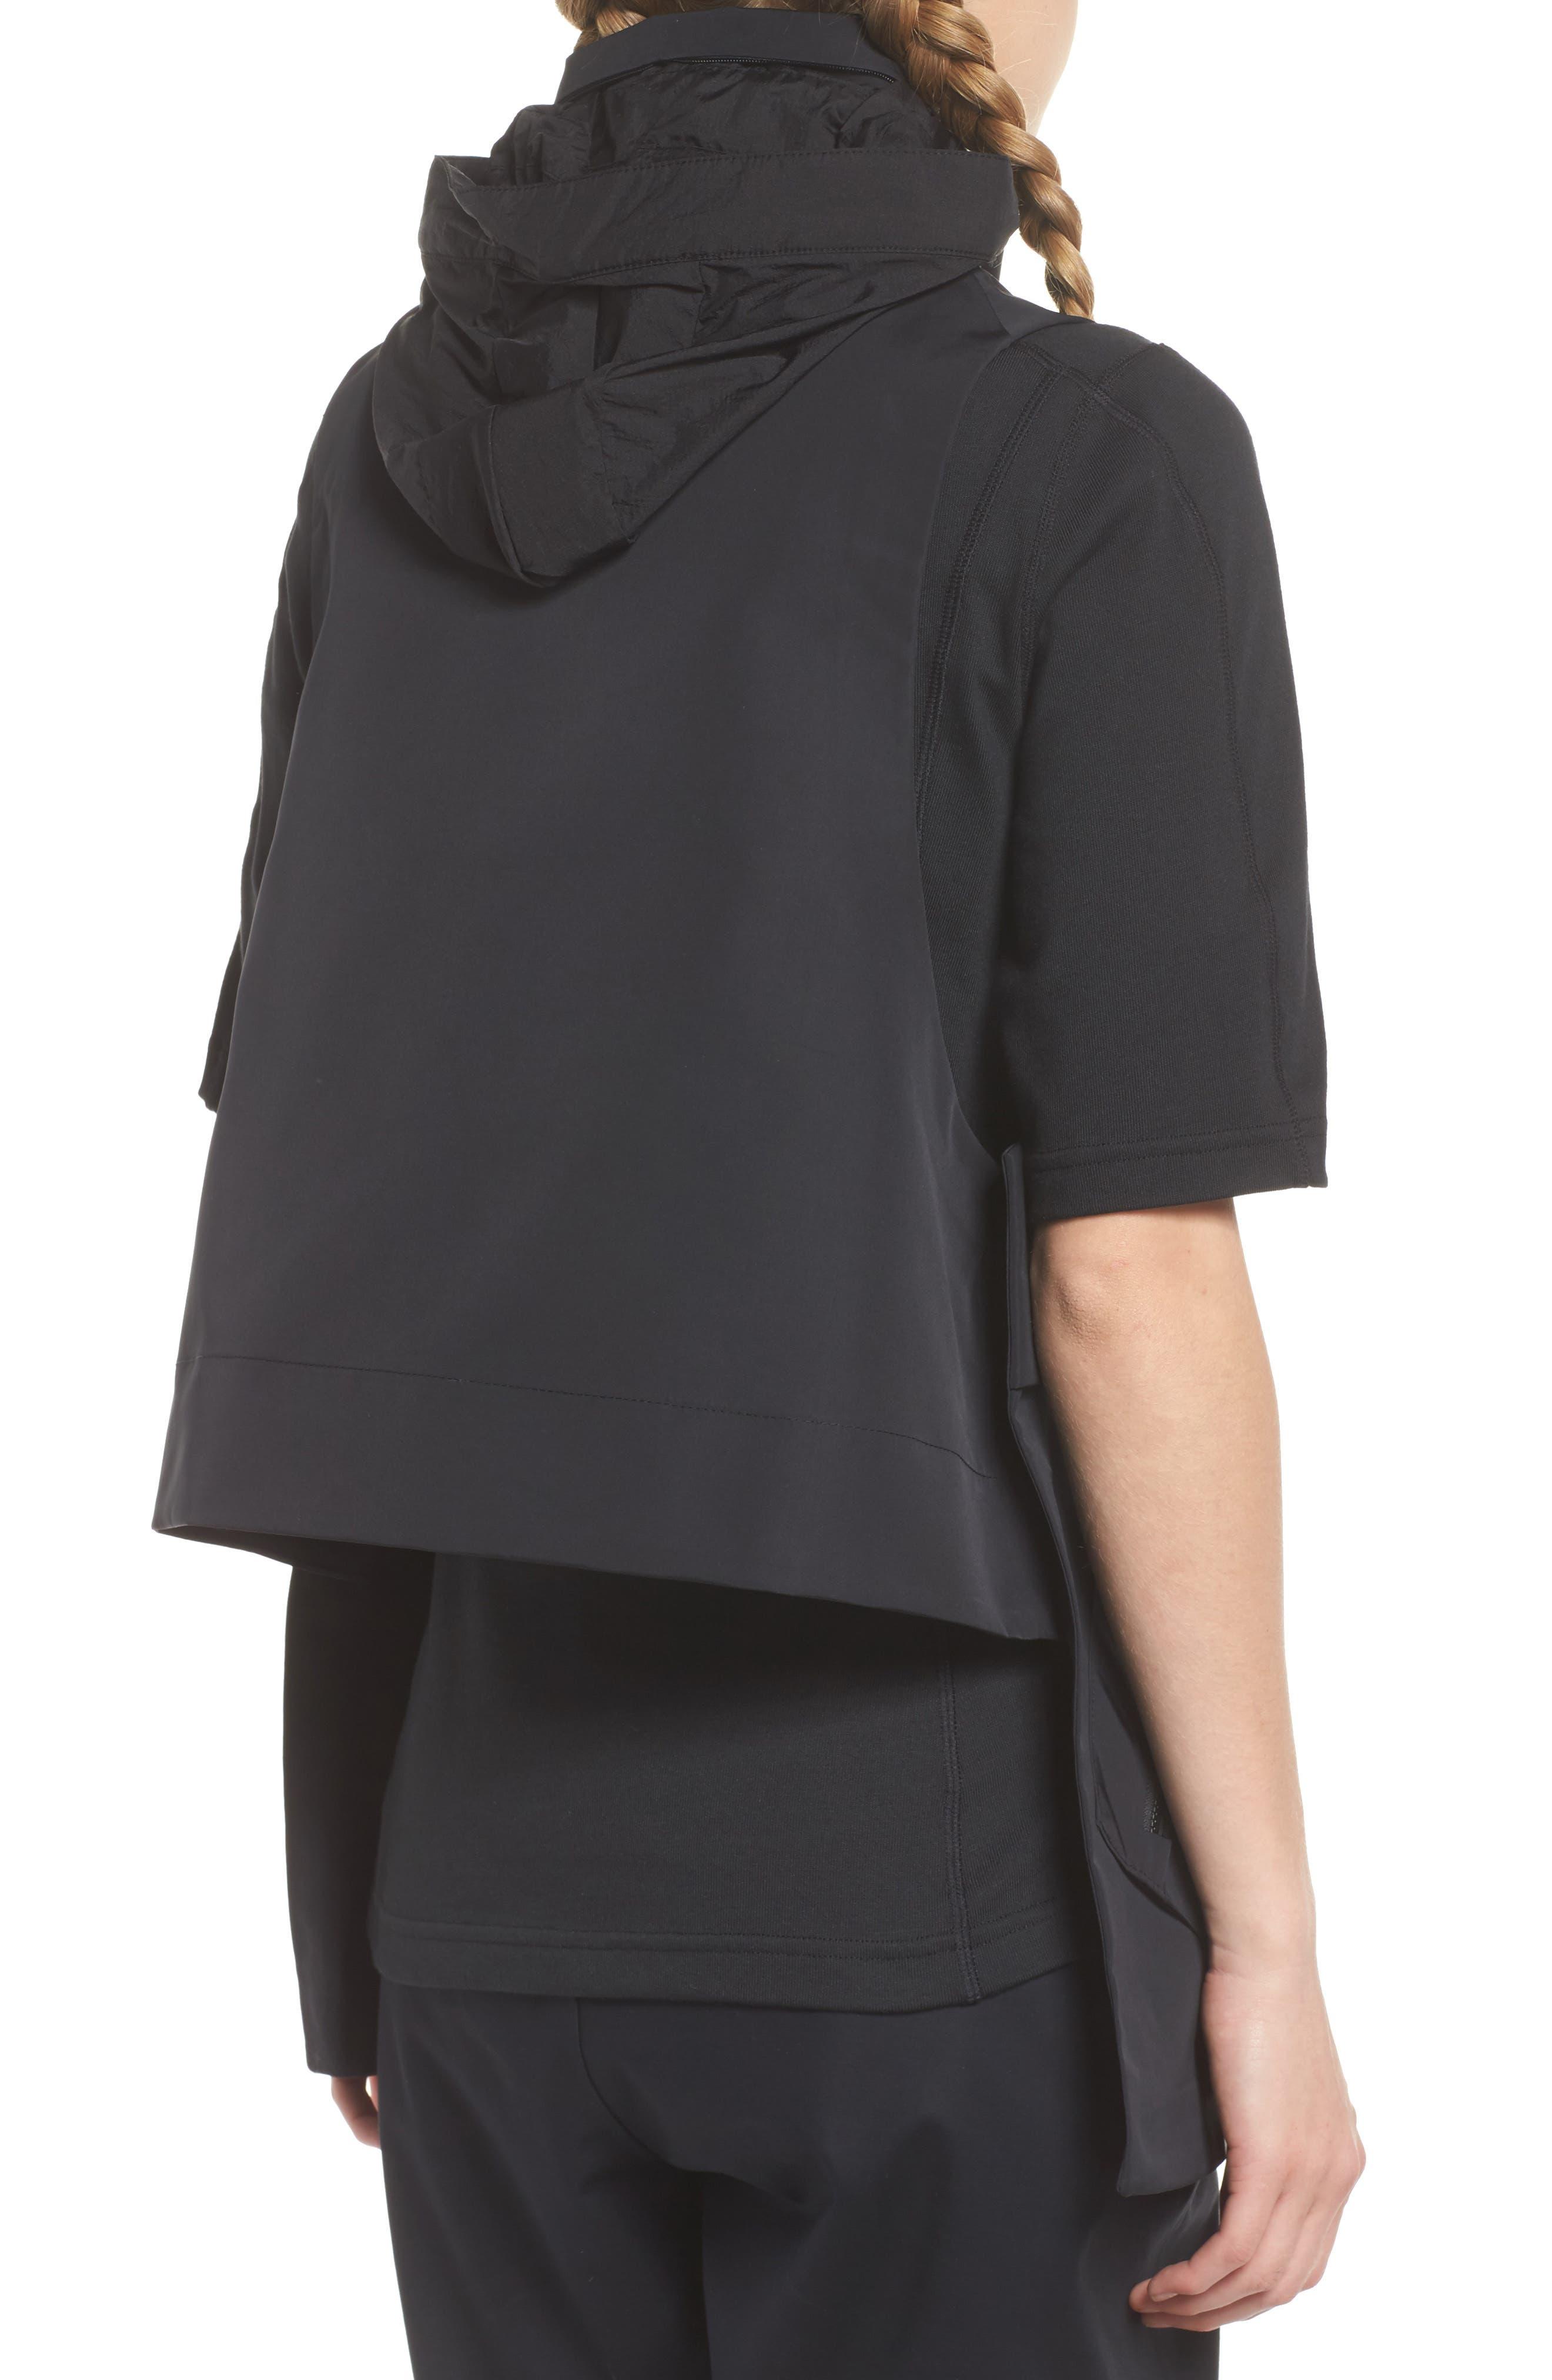 NikeLab ACG Water Repellent Women's Hooded Vest,                             Alternate thumbnail 2, color,                             010